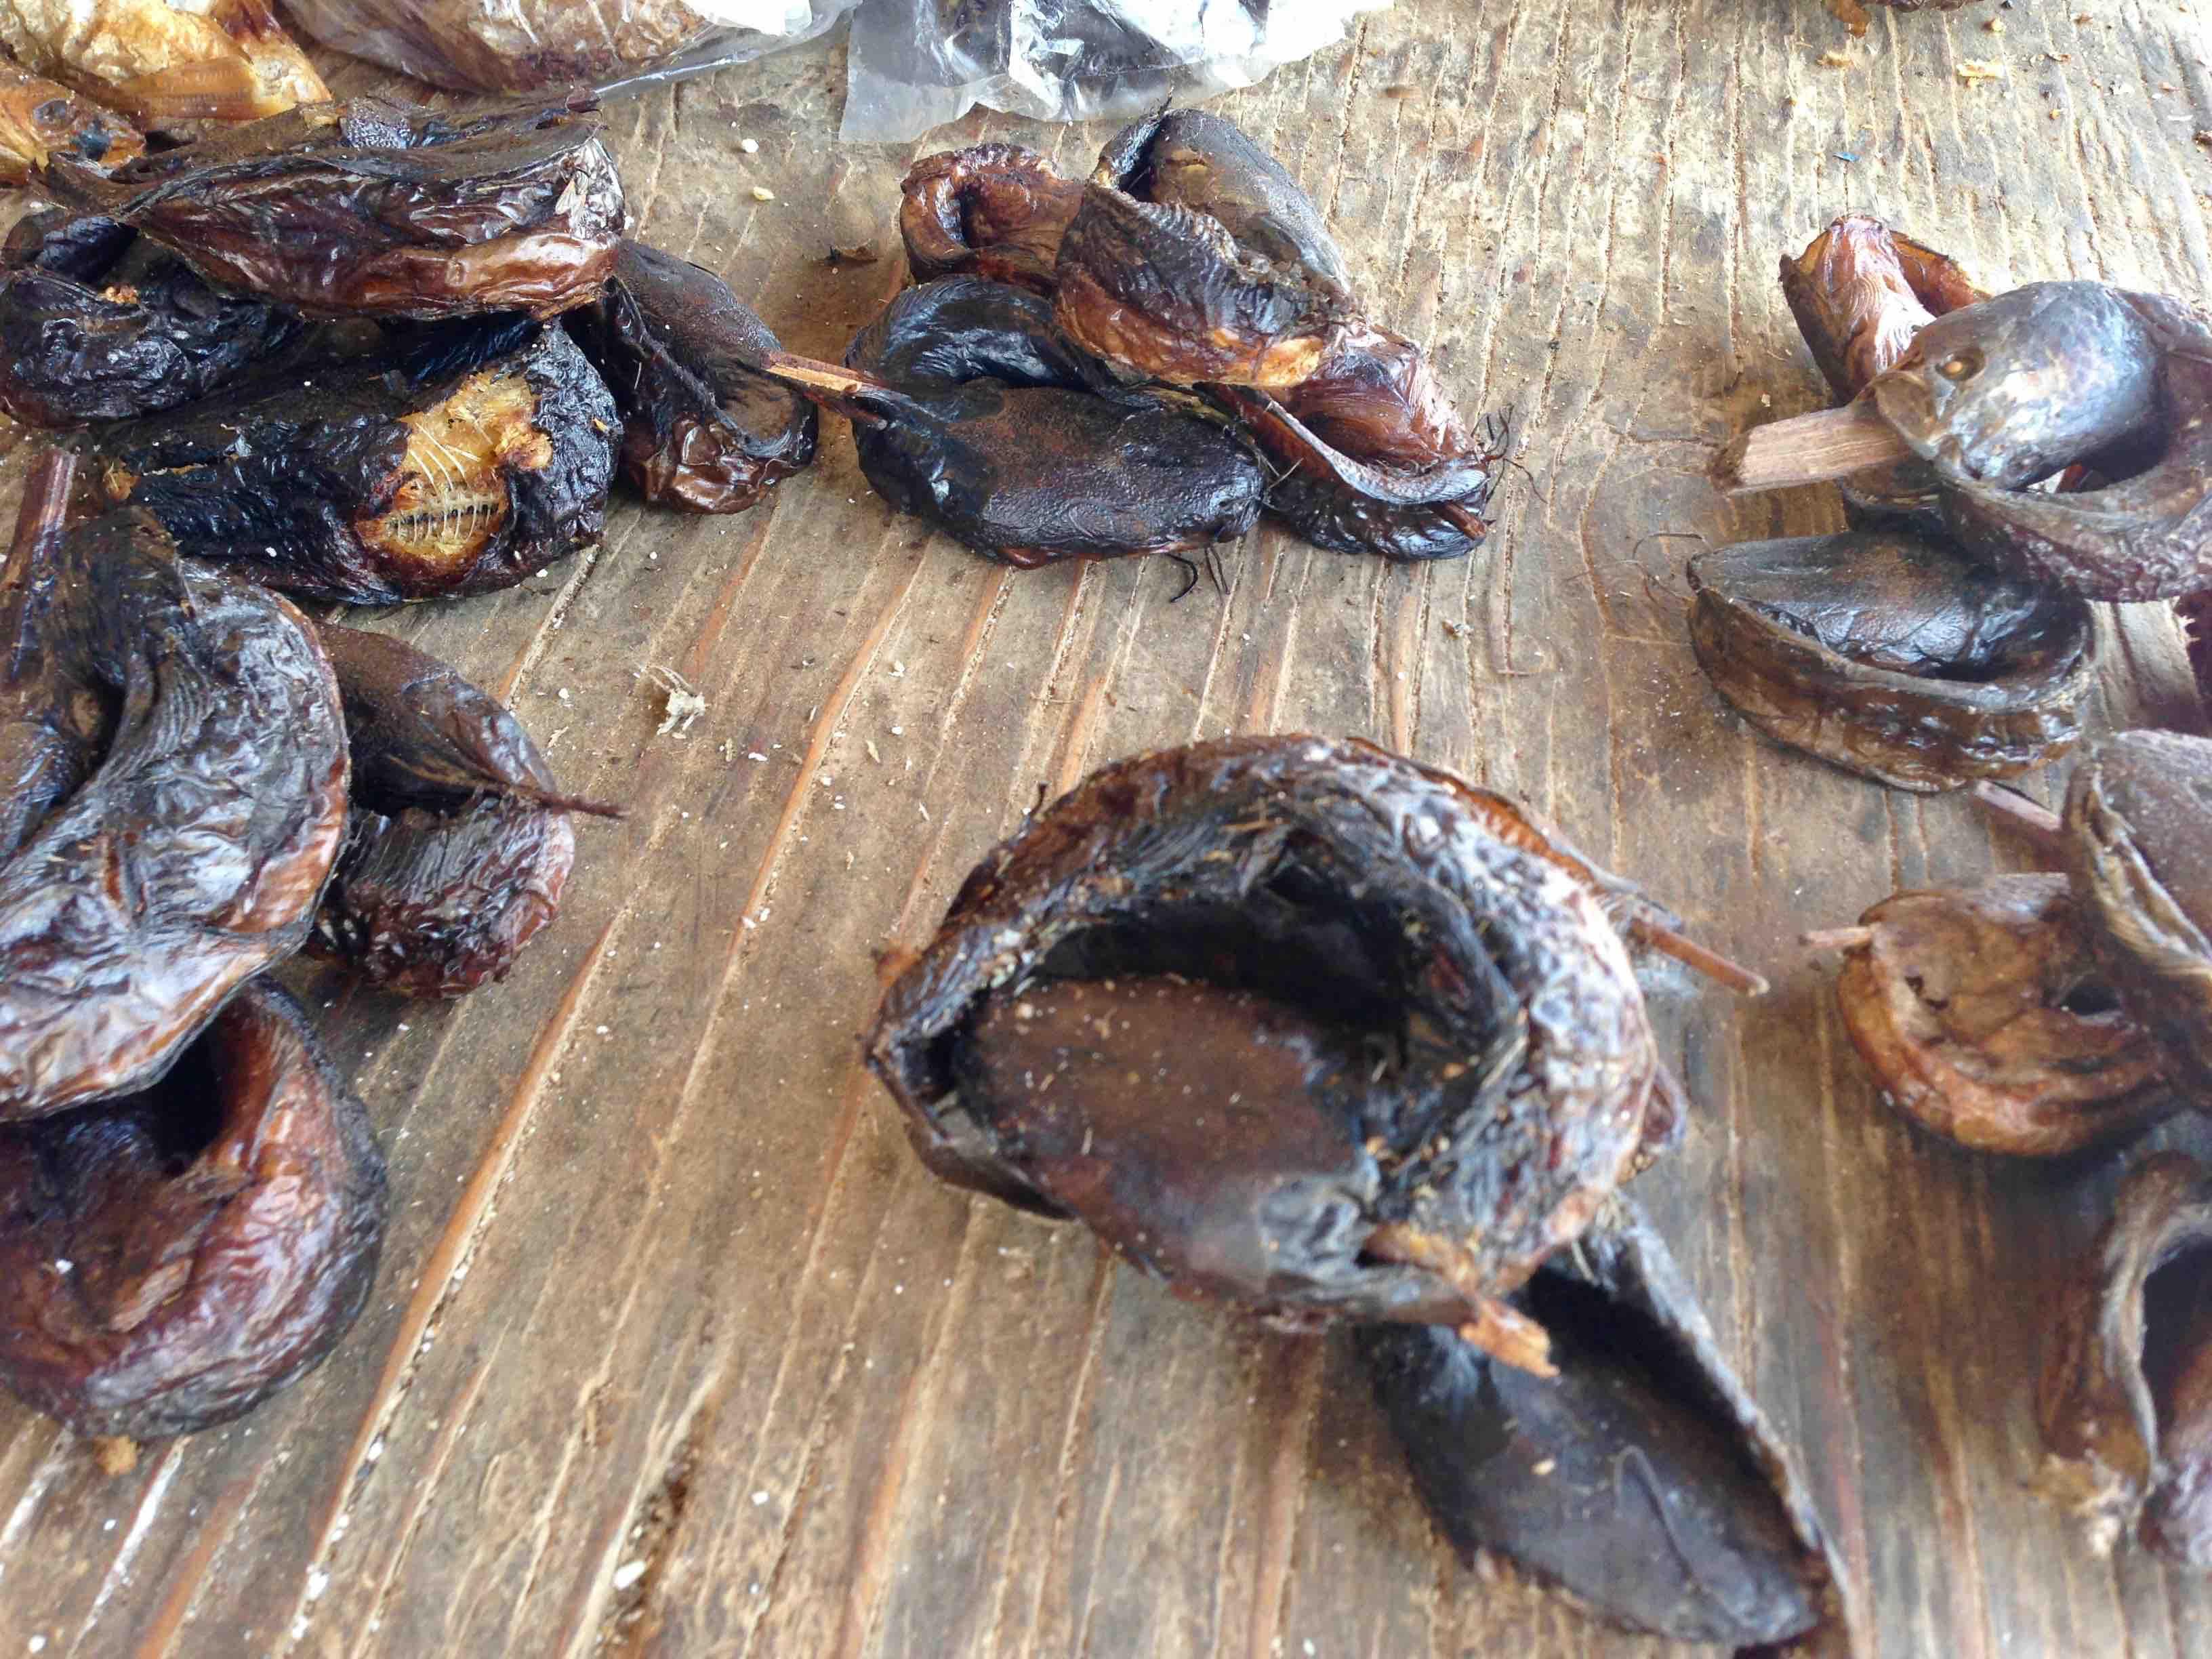 Smoked fish, Ushafa Village, Abuja, Nigeria. #JujuFilms